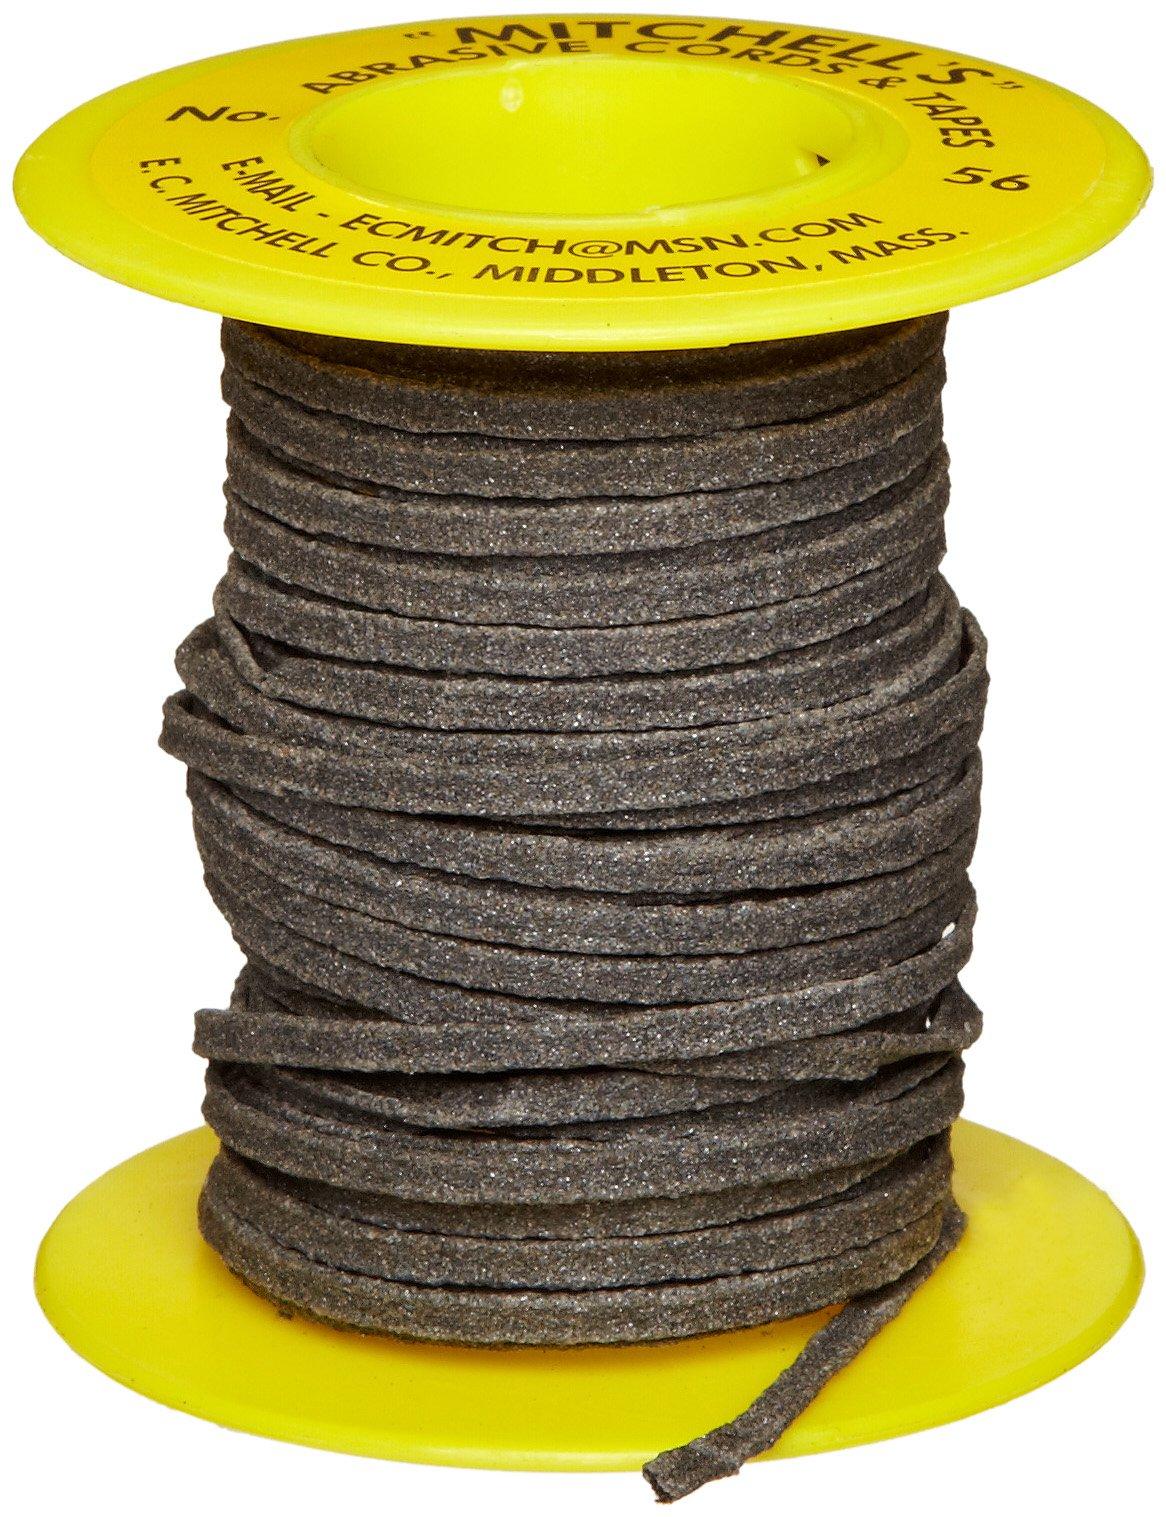 Mitchell Abrasives 56 Flat Abrasive Tape, Aluminum Oxide 150 Grit 3/32'' Wide x 25 Feet